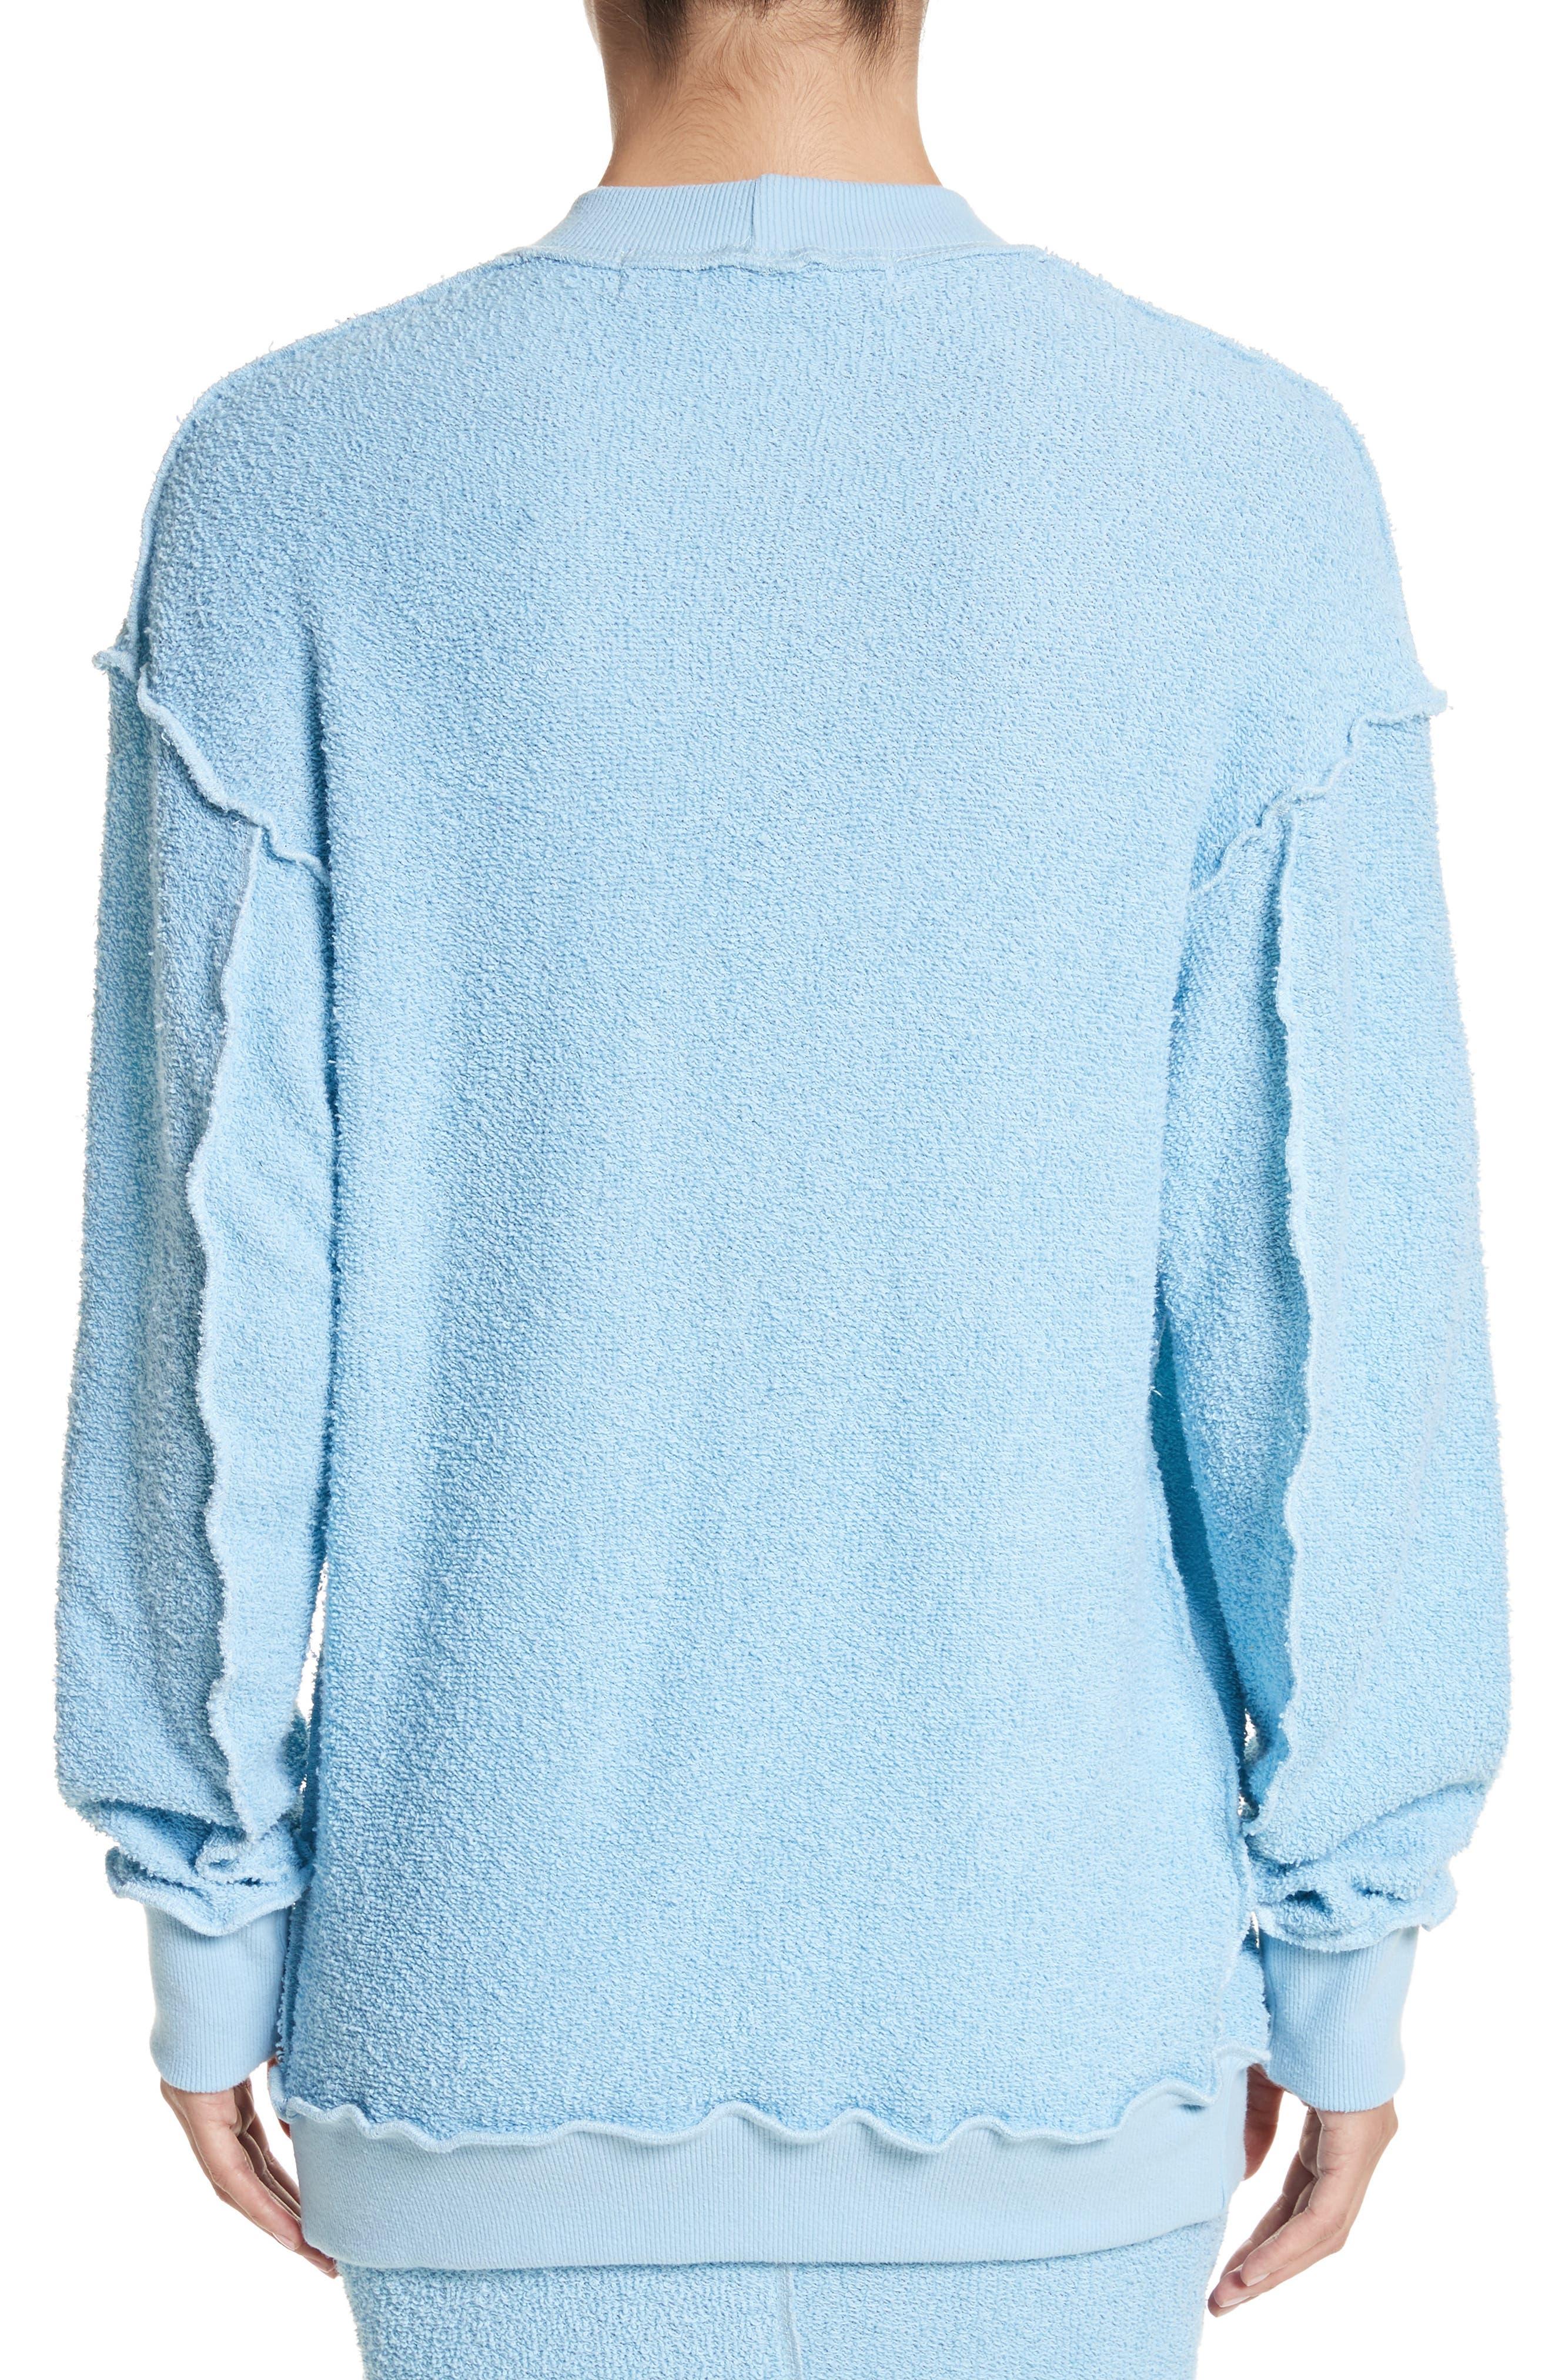 Alternate Image 2  - Eckhaus Latta Drop Shoulder Reverse Terry Sweatshirt